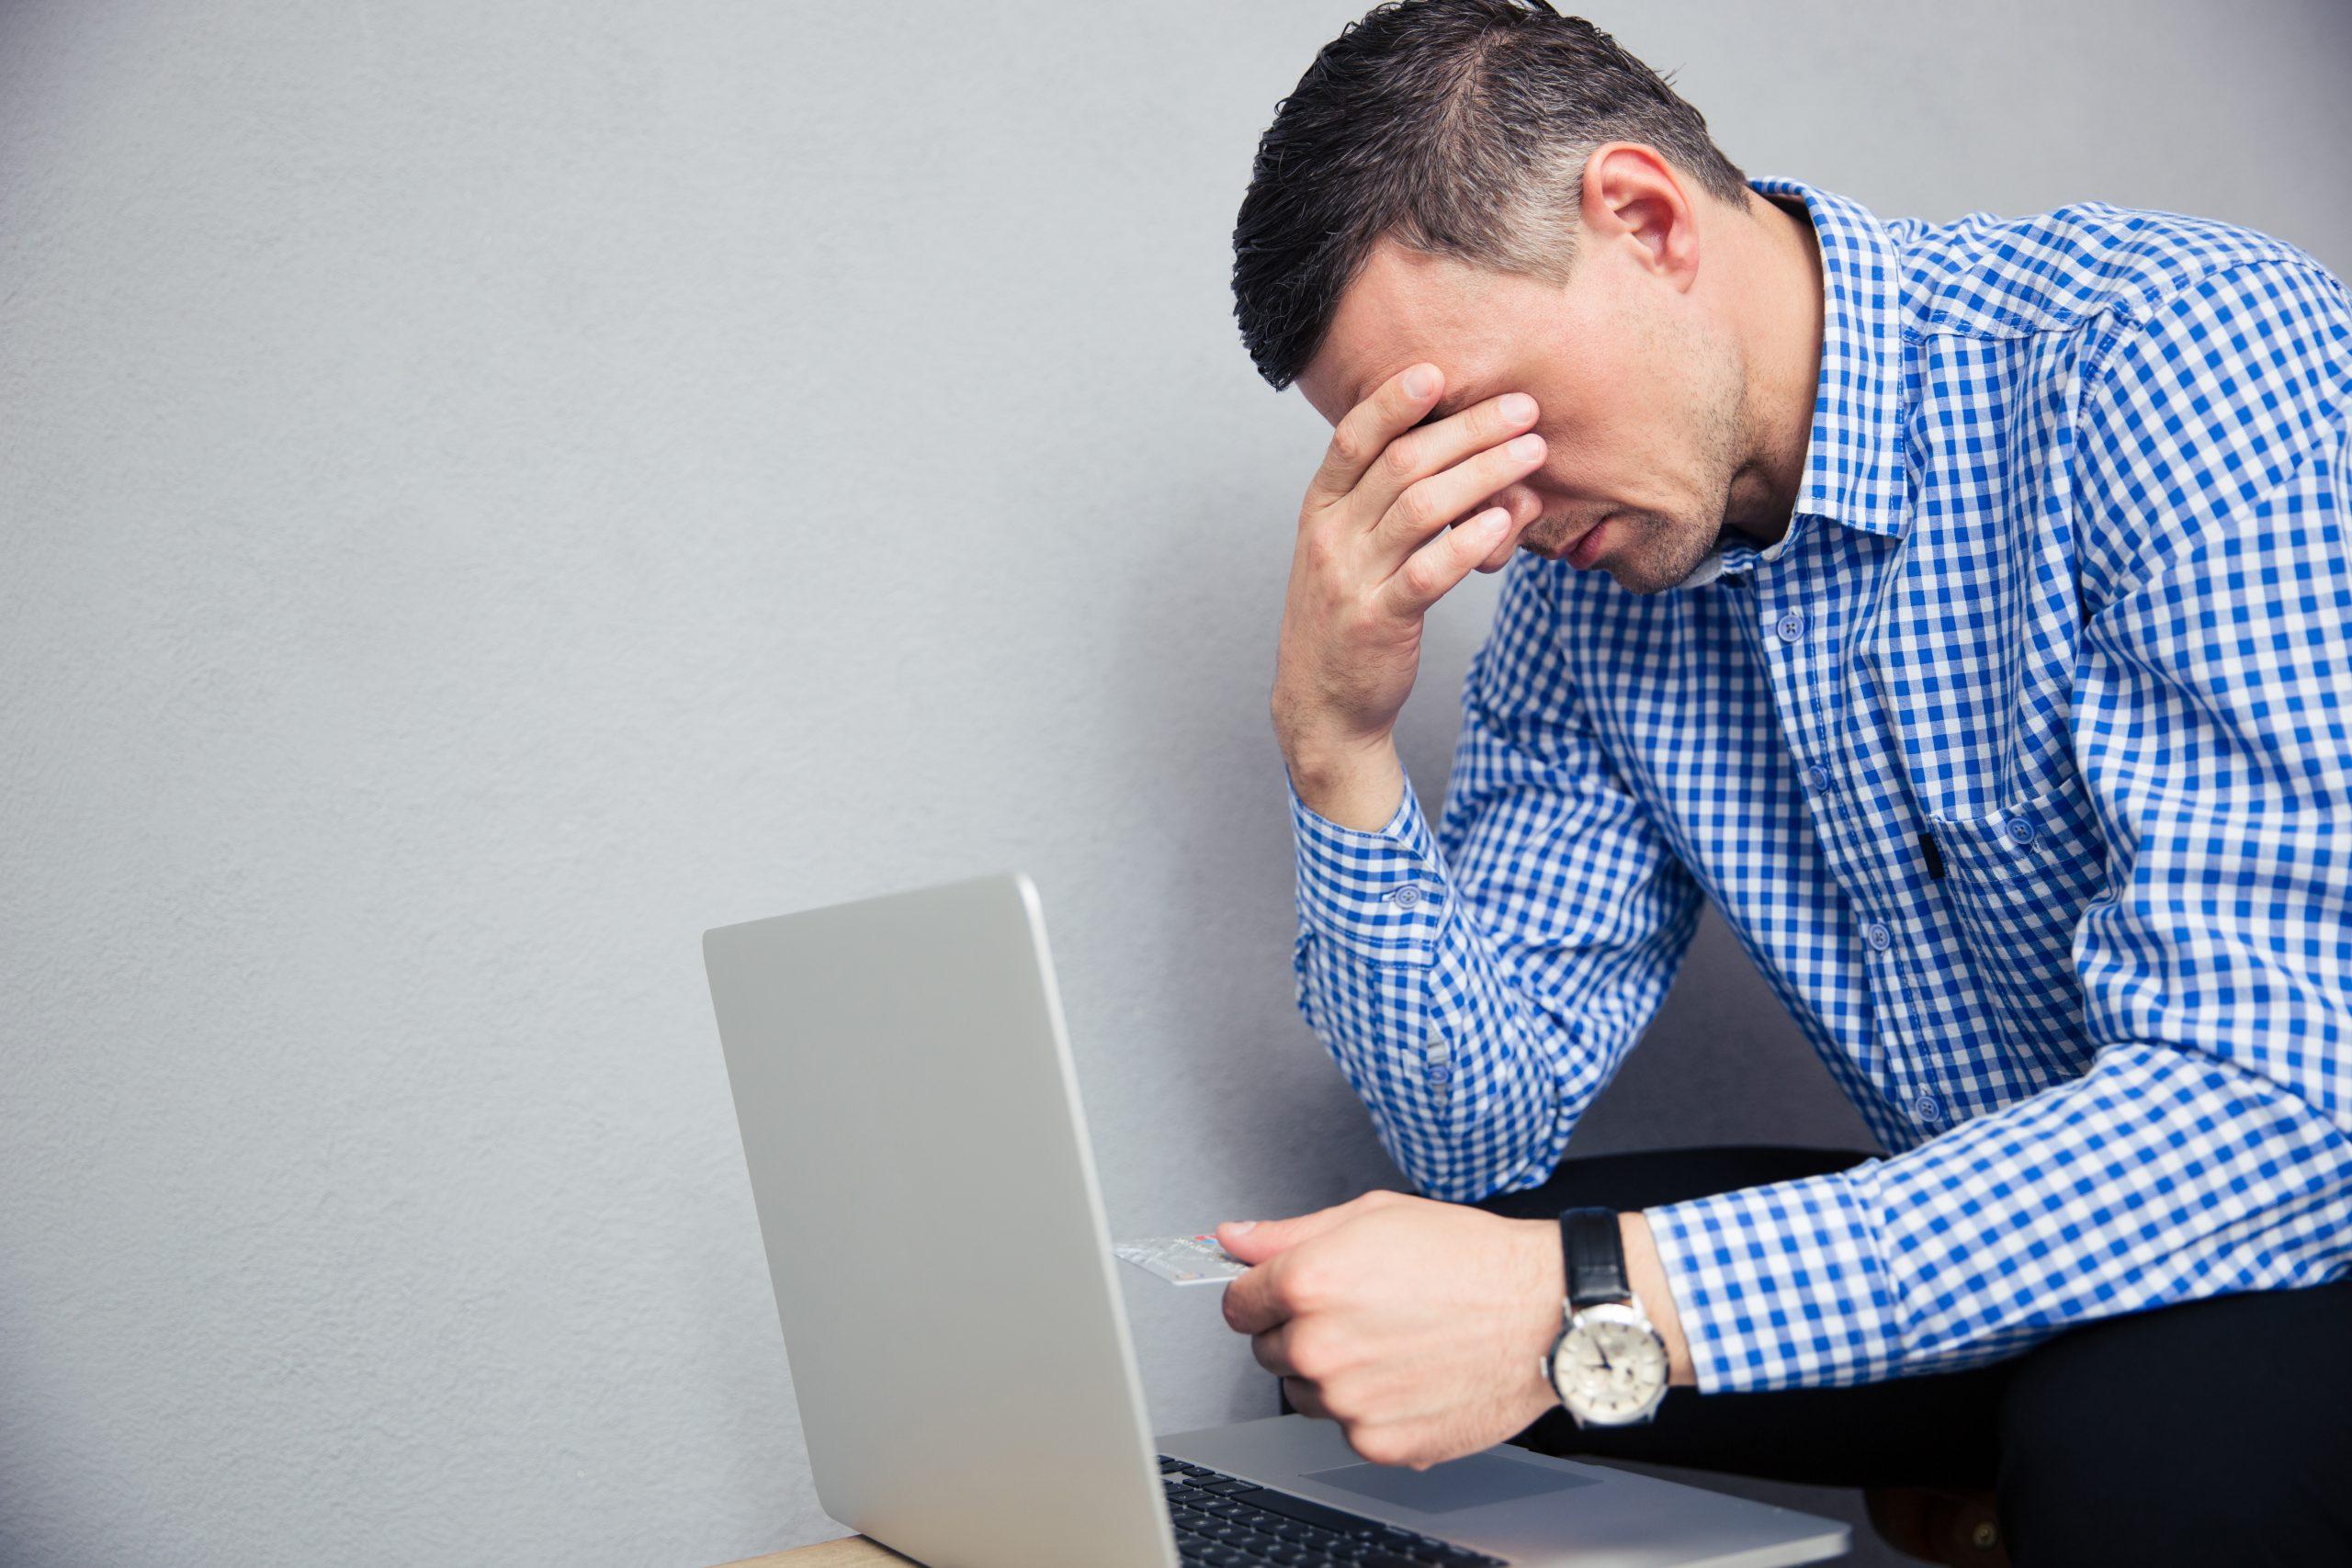 depressed man holding credit card scaled